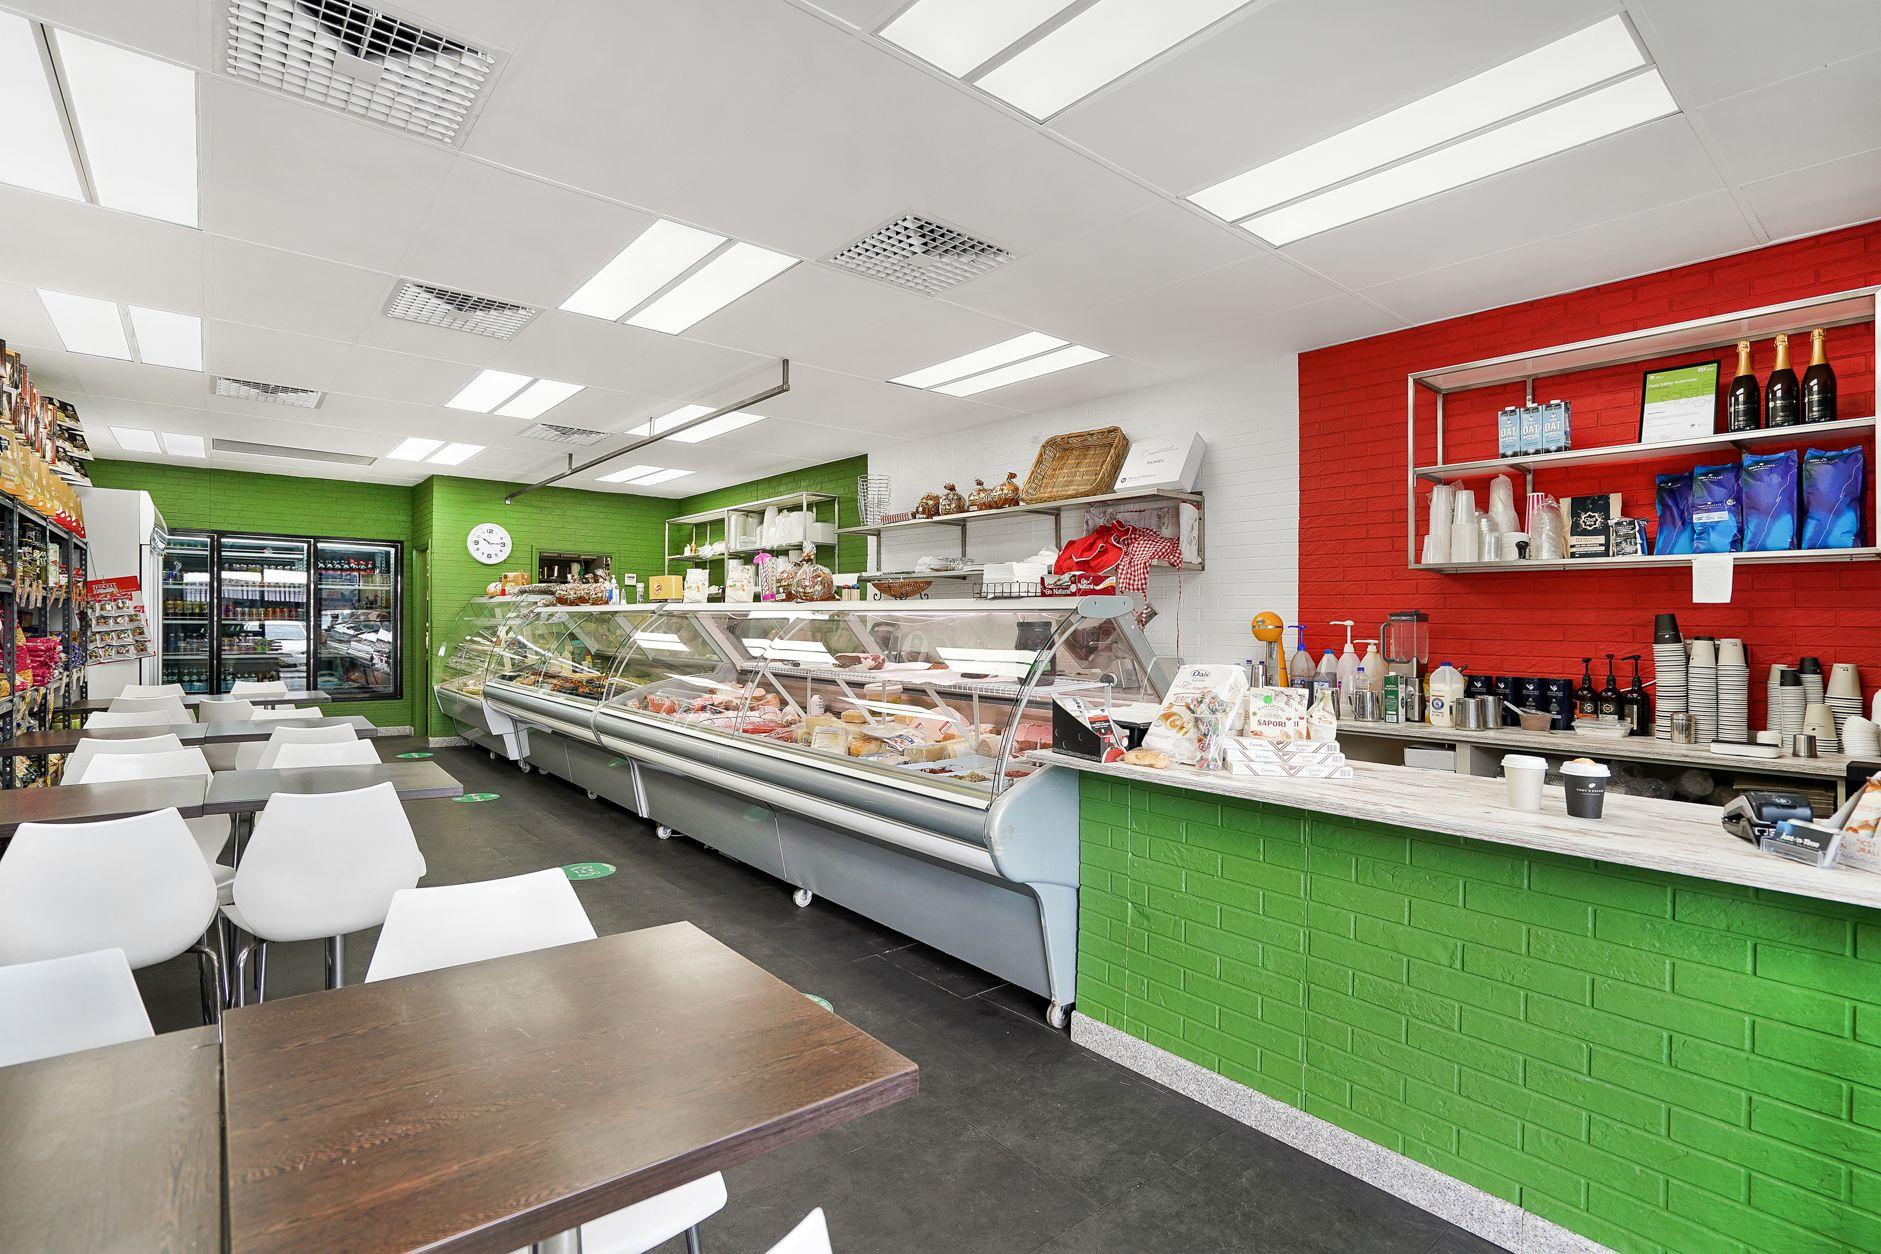 4/52 Simmat Avenue, Condell Park NSW 2200